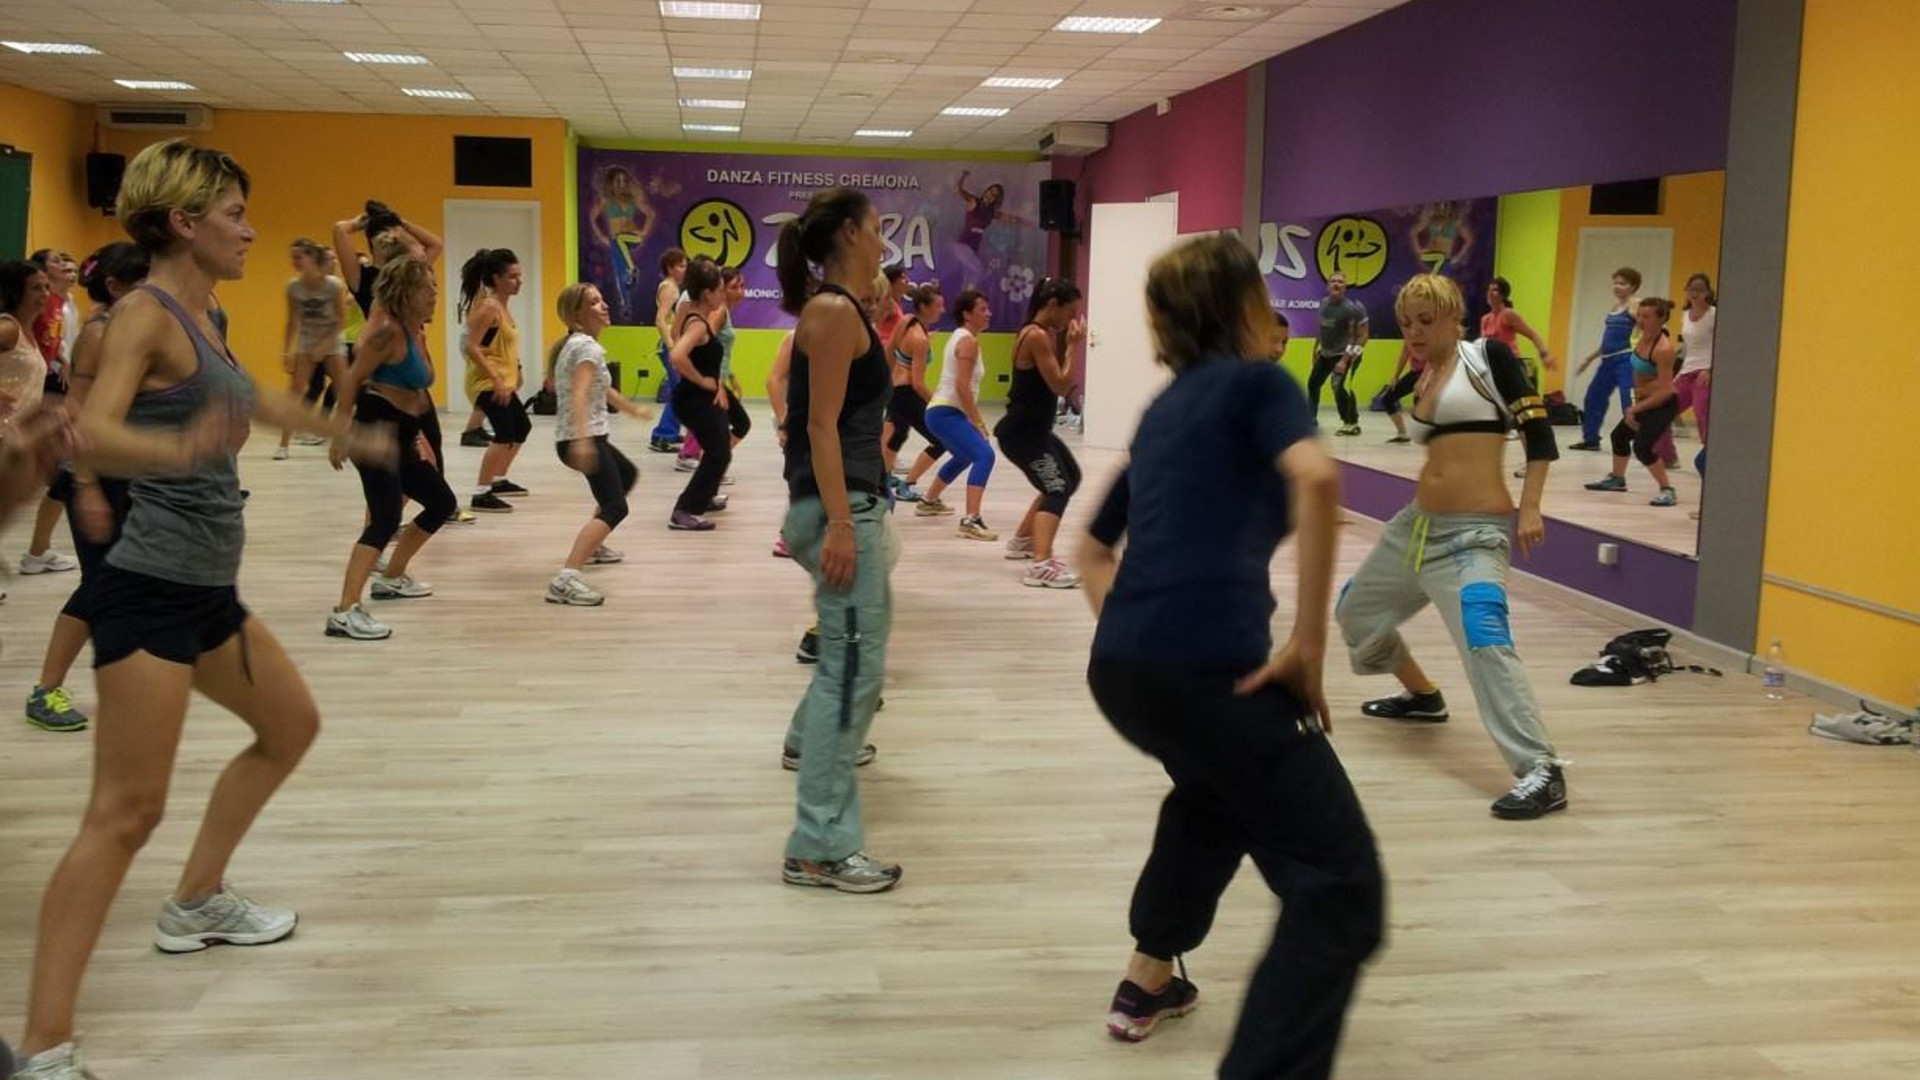 Danza Fitness Studio offerte